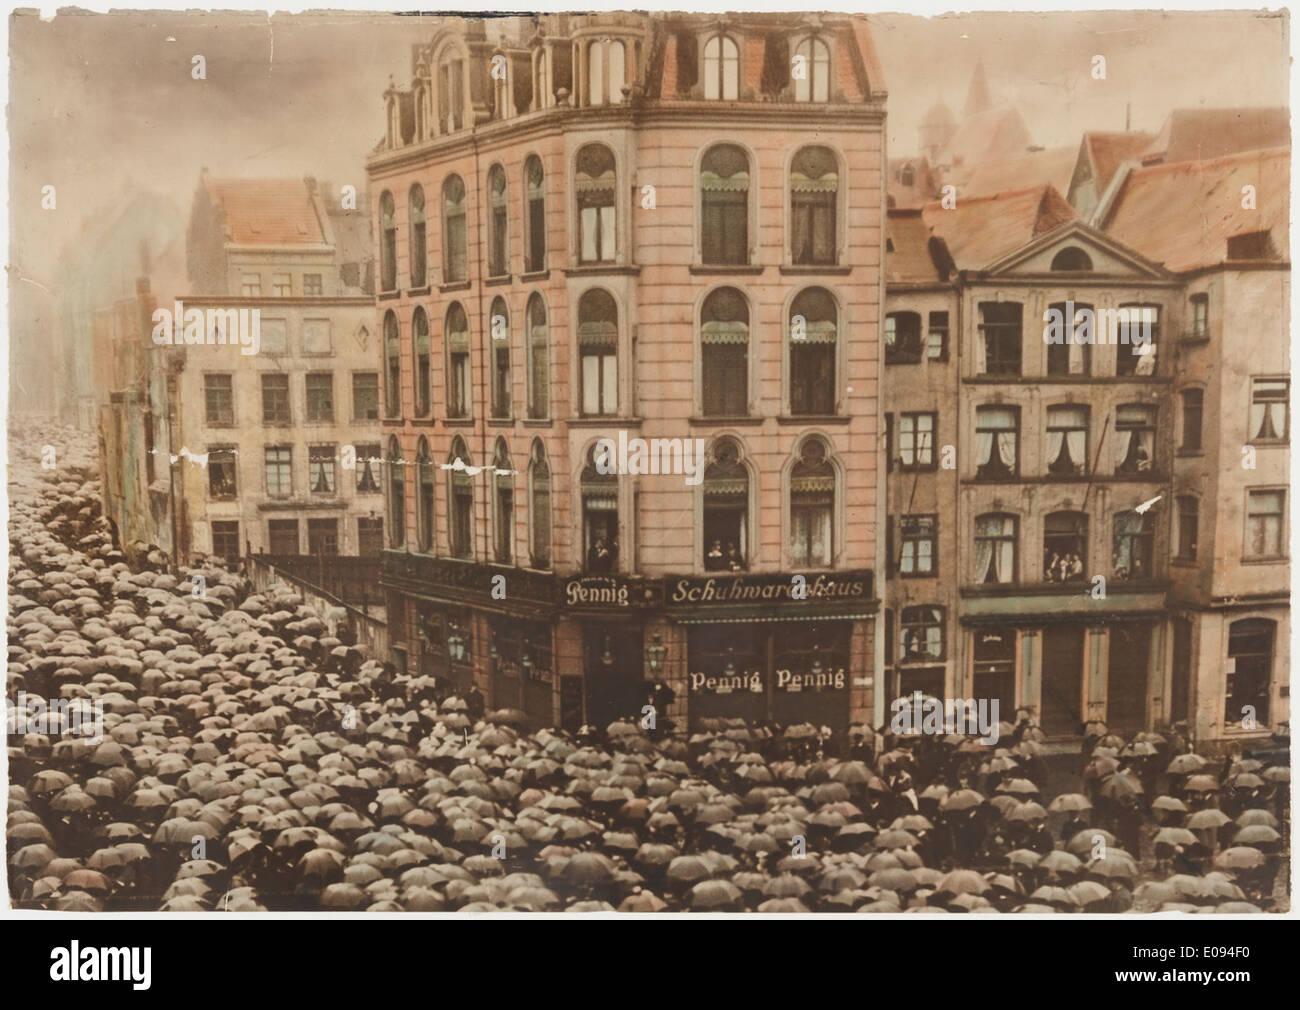 German crowd with umbrellas Stock Photo